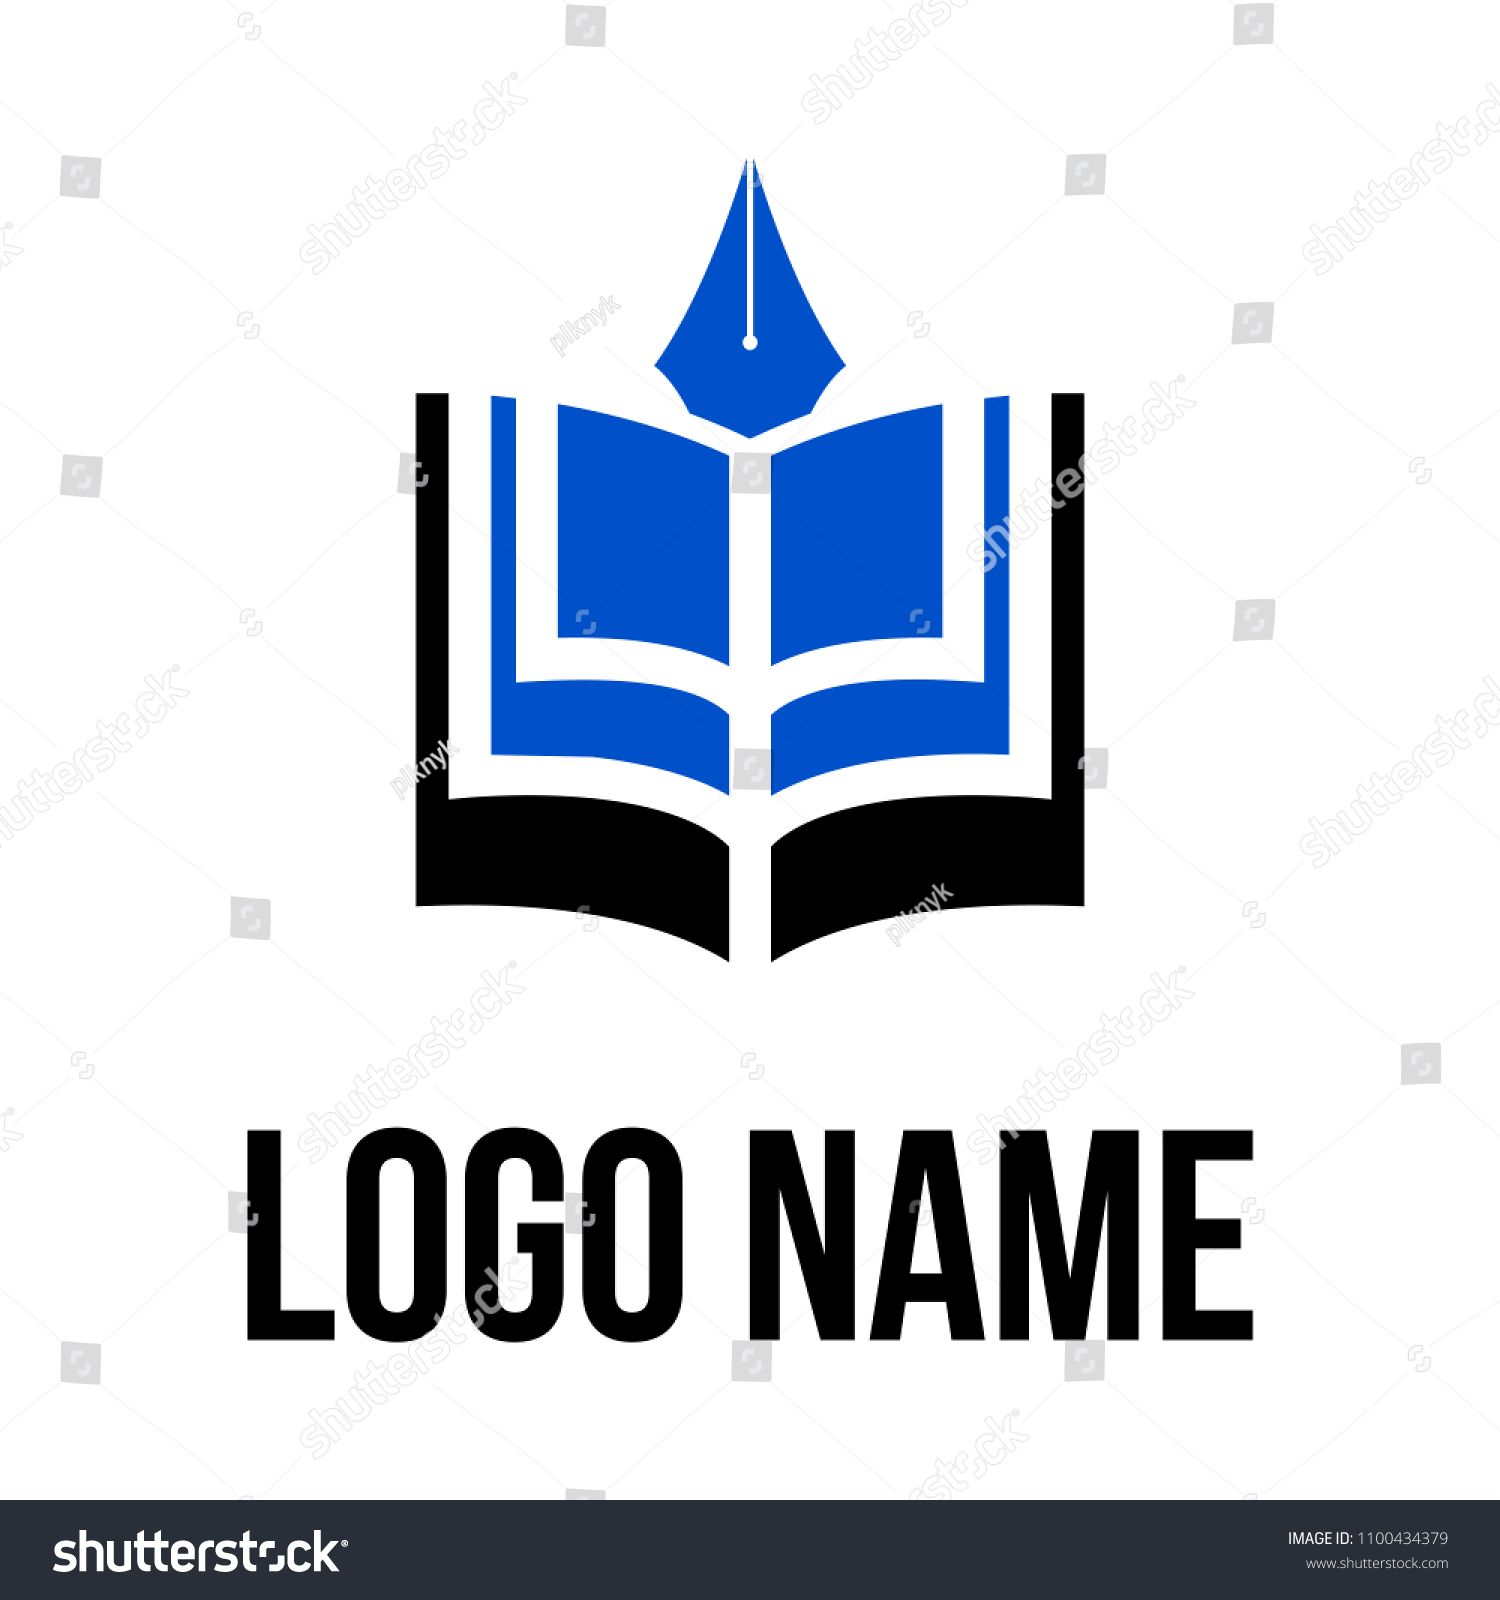 Book Logo Vector Icon Illustration N Ad Sponsored Logo Book Vector Illustrationn In 2020 Book Logo Vector Icons Illustration Vector Logo